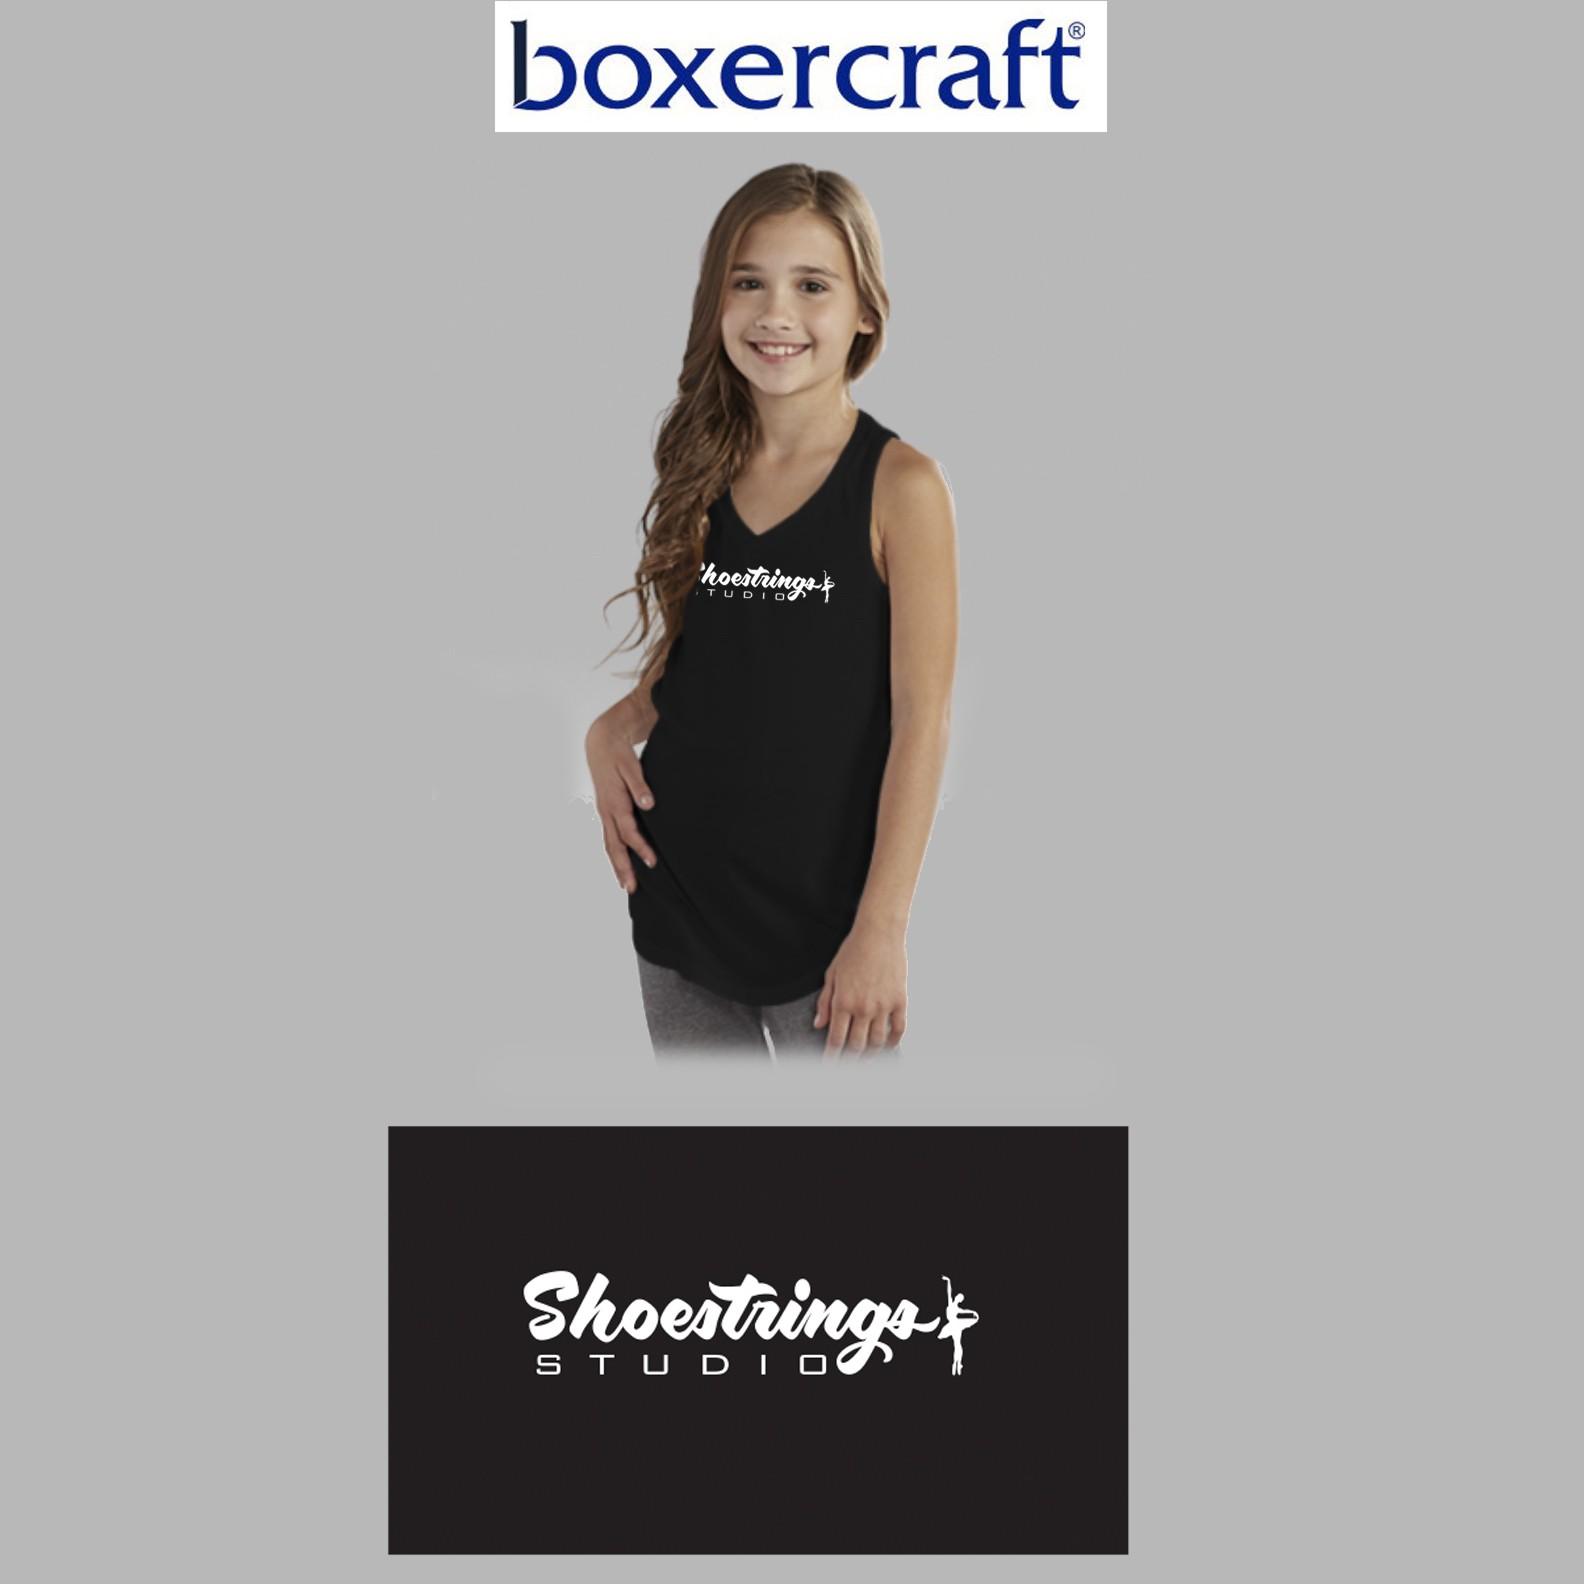 Shoestrings Studio Boxercraft At Ease Tank, Youth